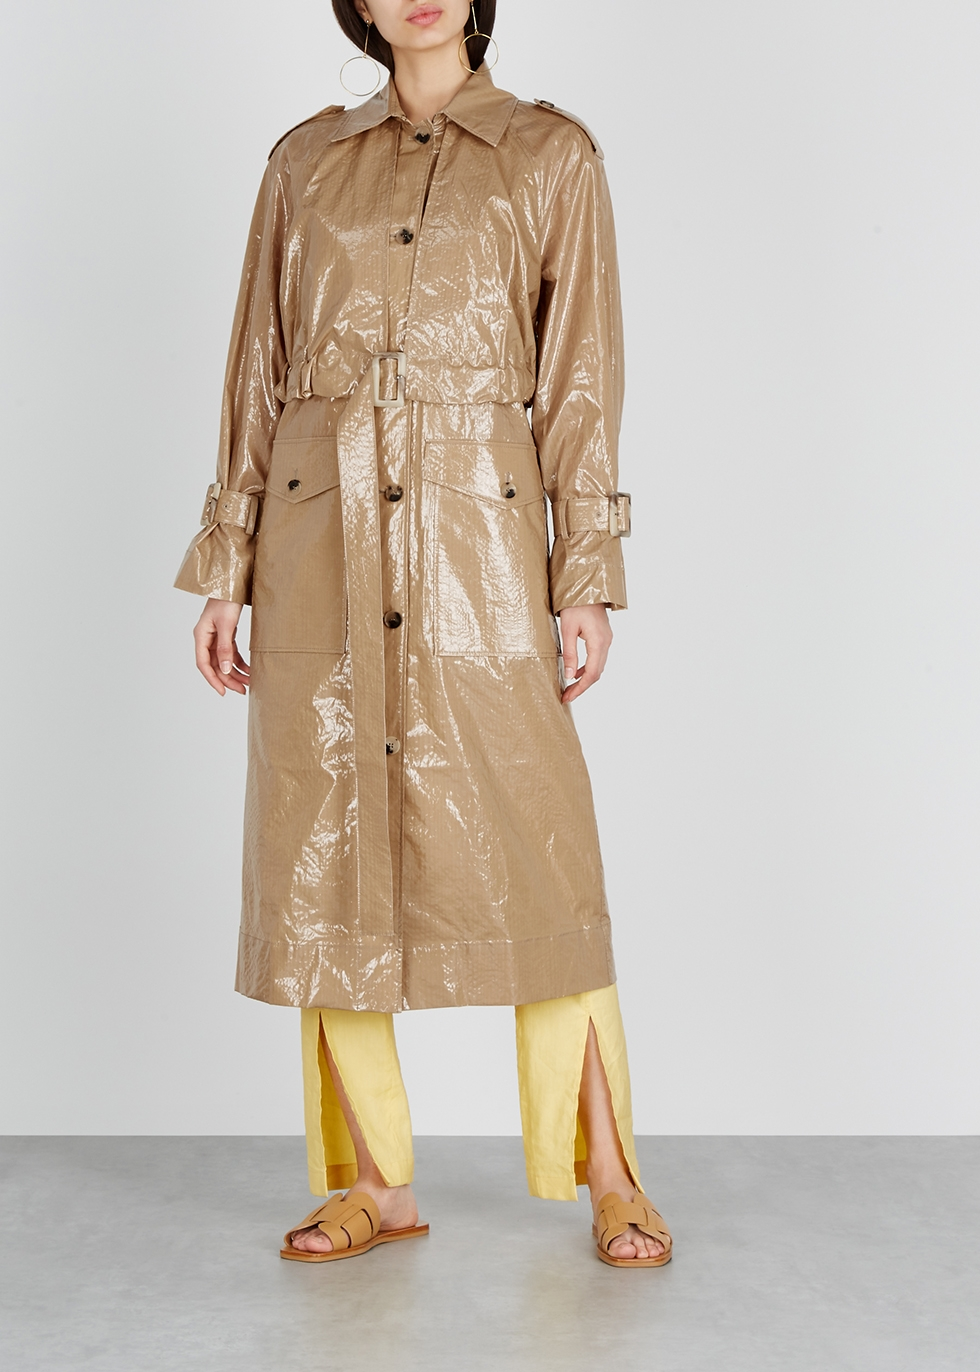 Wren coated cotton trench coat - Rejina Pyo